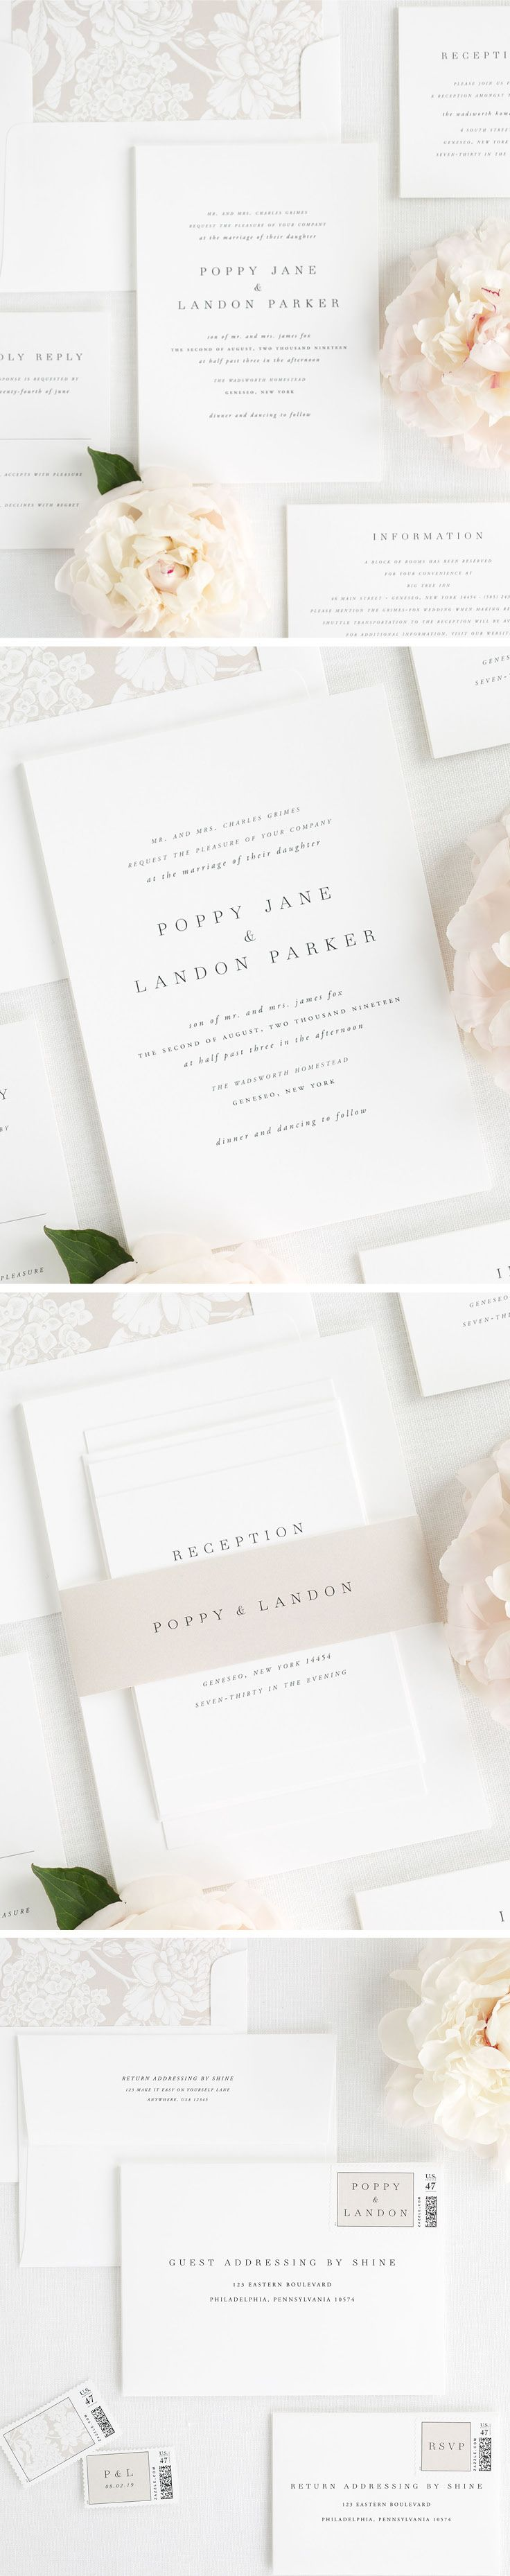 Small Caps Font For Wedding Invitations | Invitationjpg.com